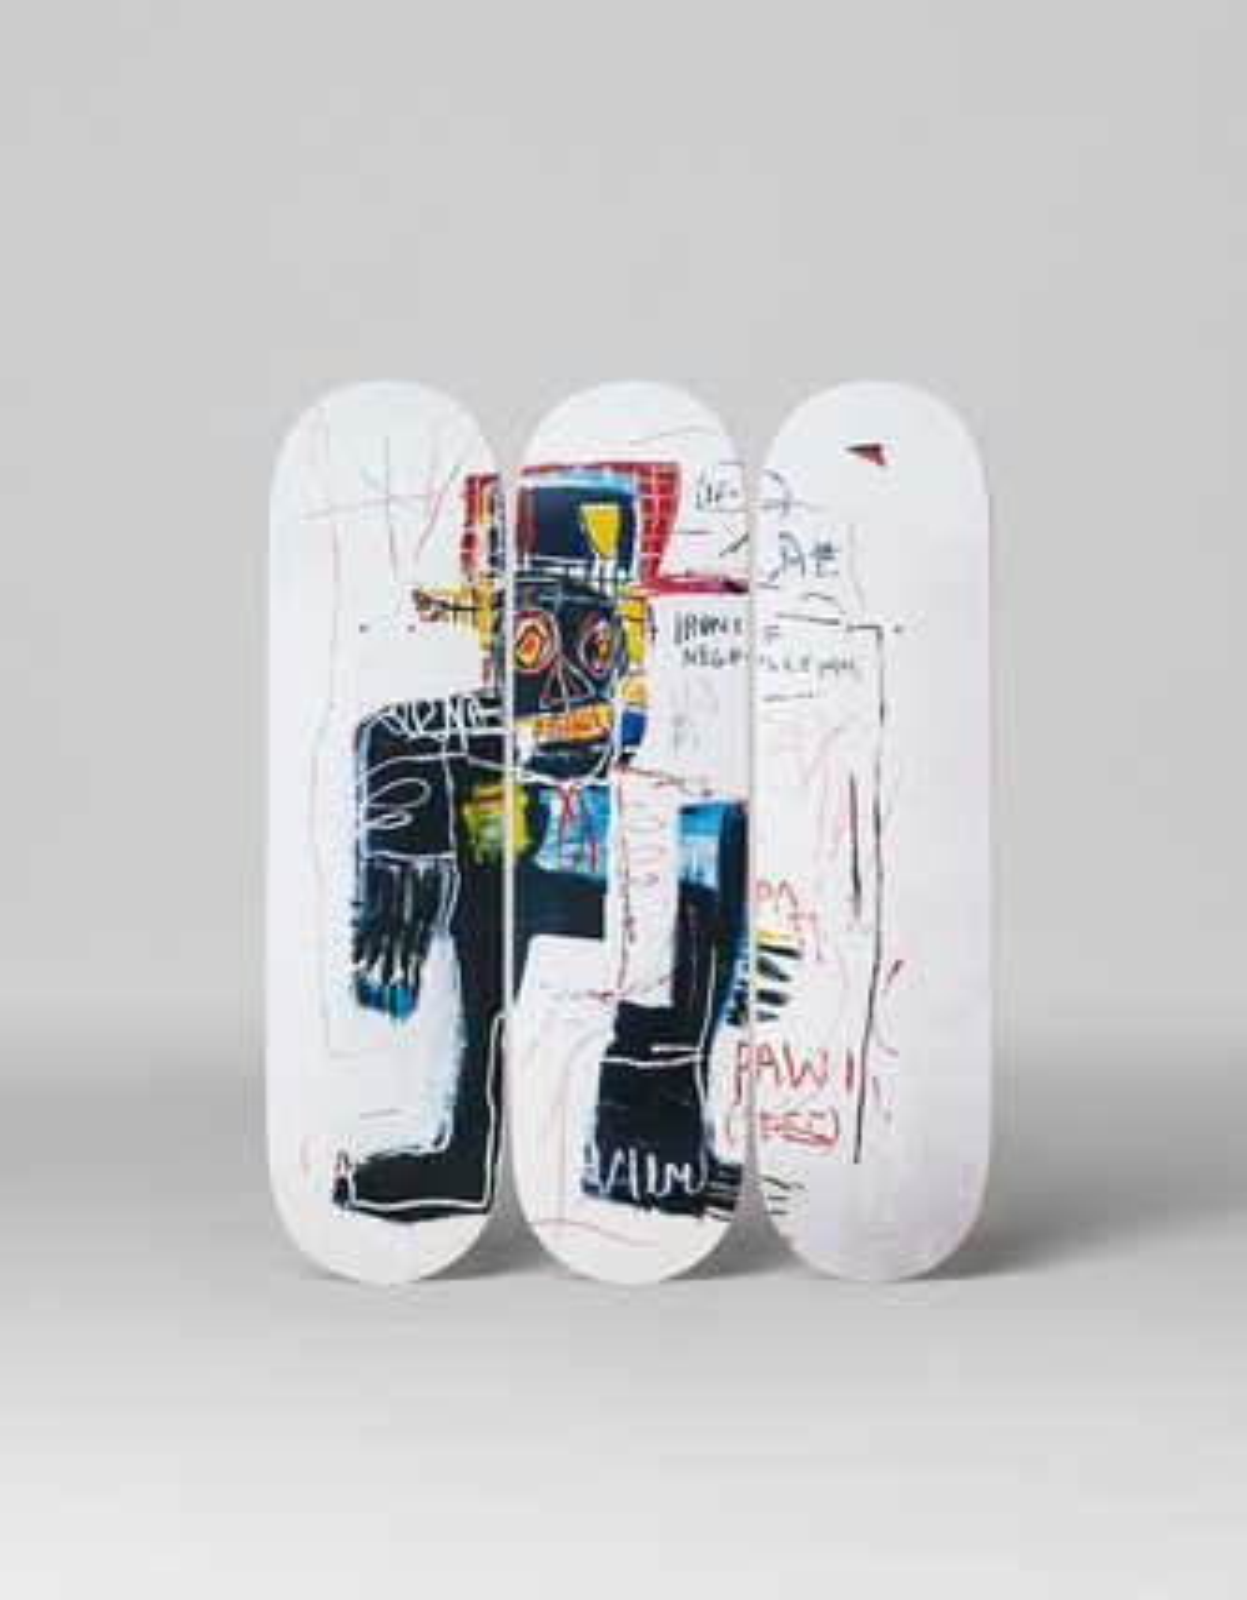 Irony of a Negro Policeman, 1981 - Jean - Michel Basquiat